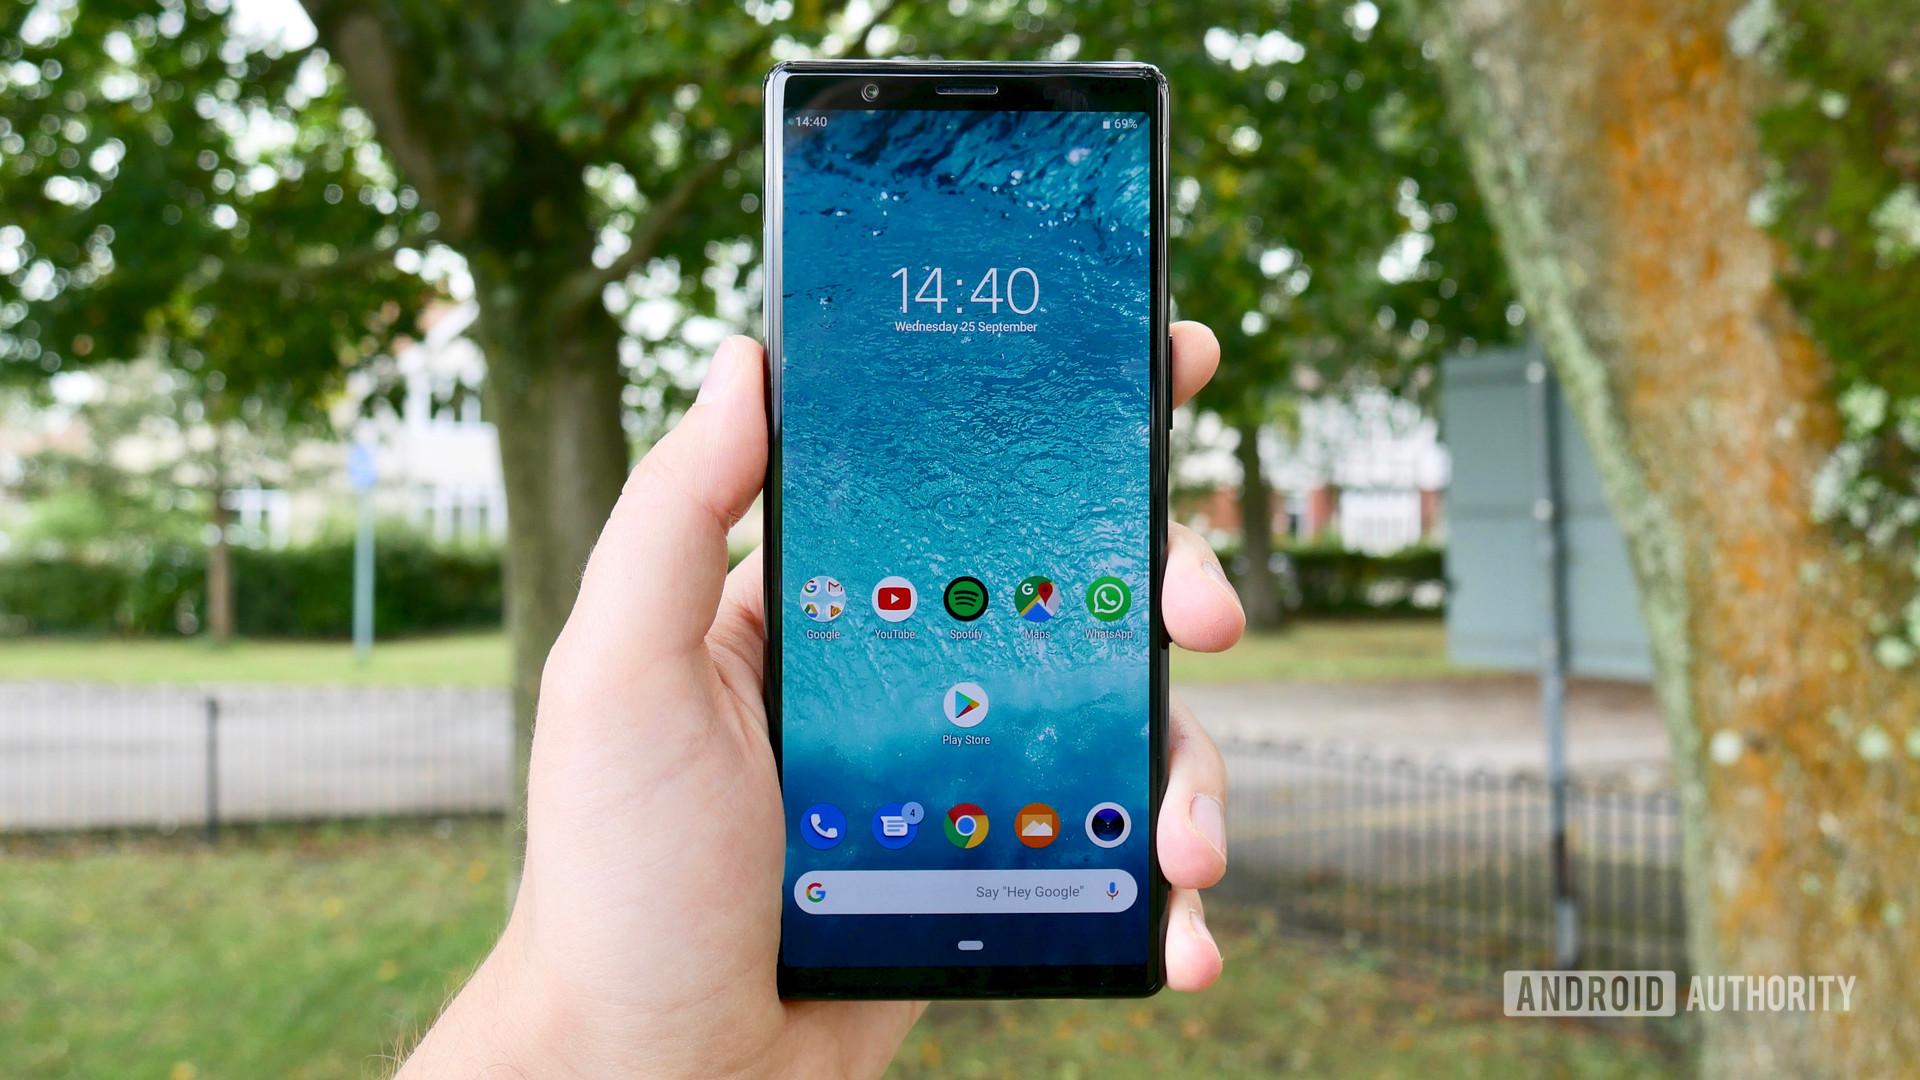 Sony наконец-то объявили, какие телефоны серии Xperia получат Android 10